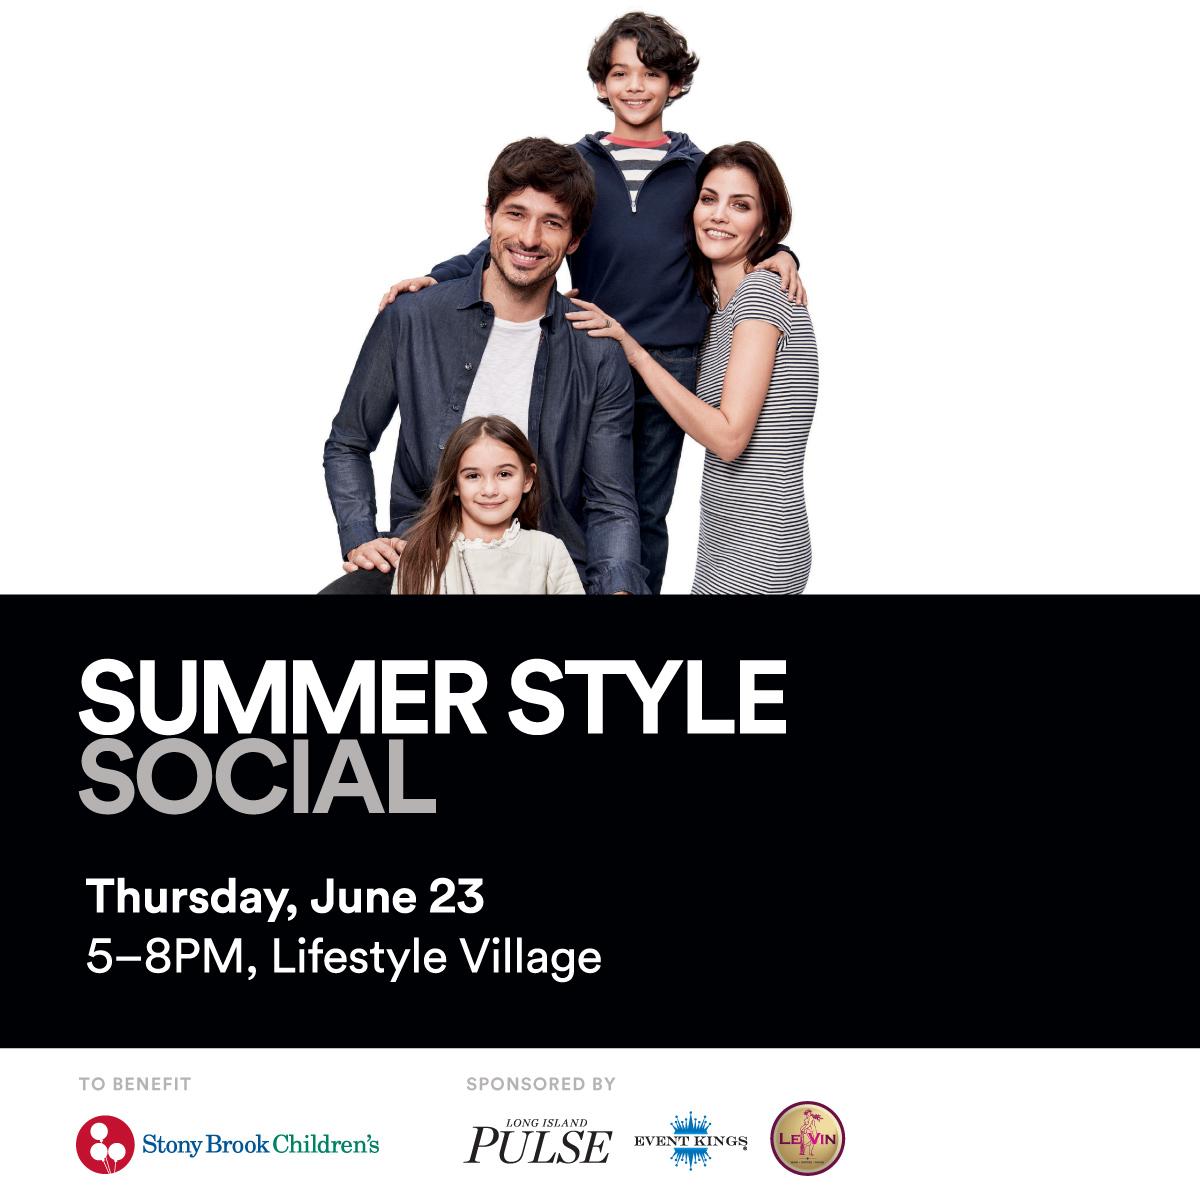 Summer style social 1